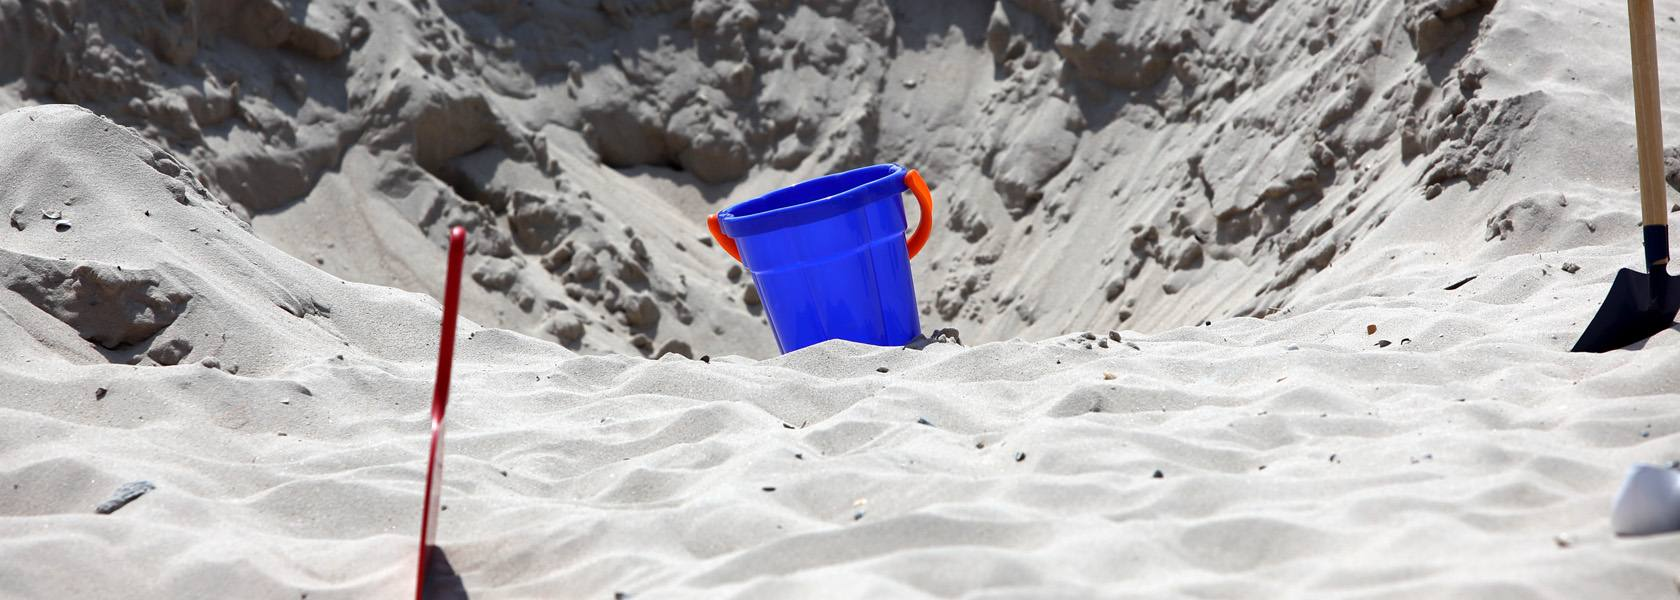 Eimer im Sand, © Ralf Graner